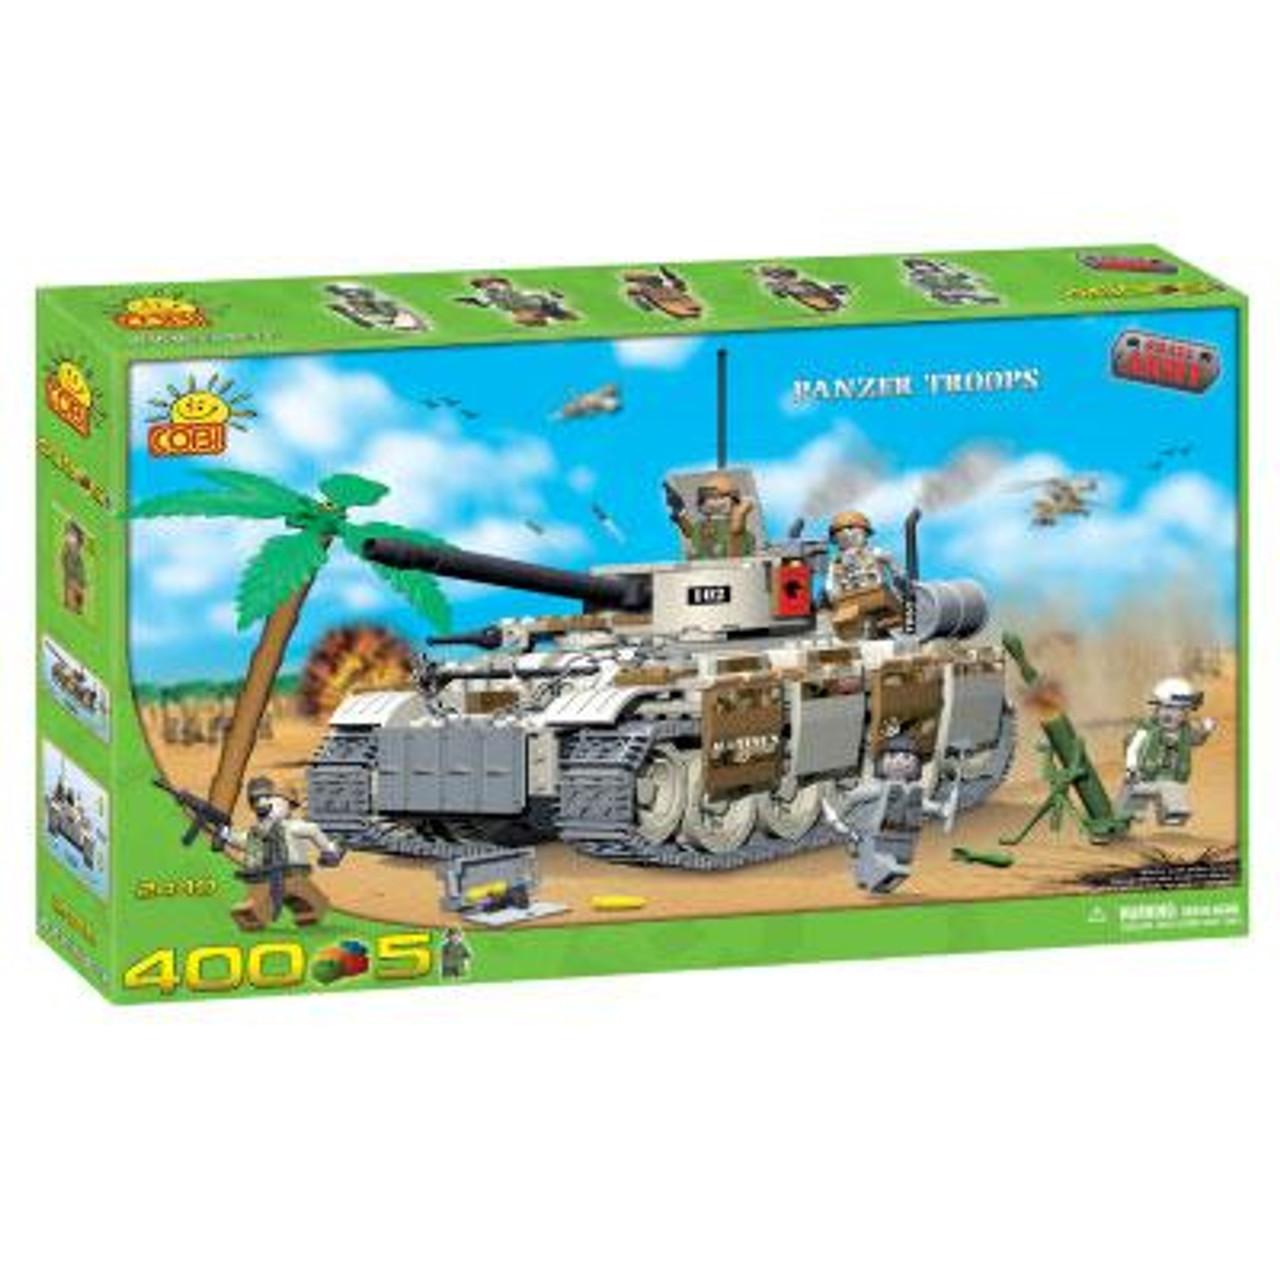 COBI Blocks Small Army Panzer Troops Set #2440